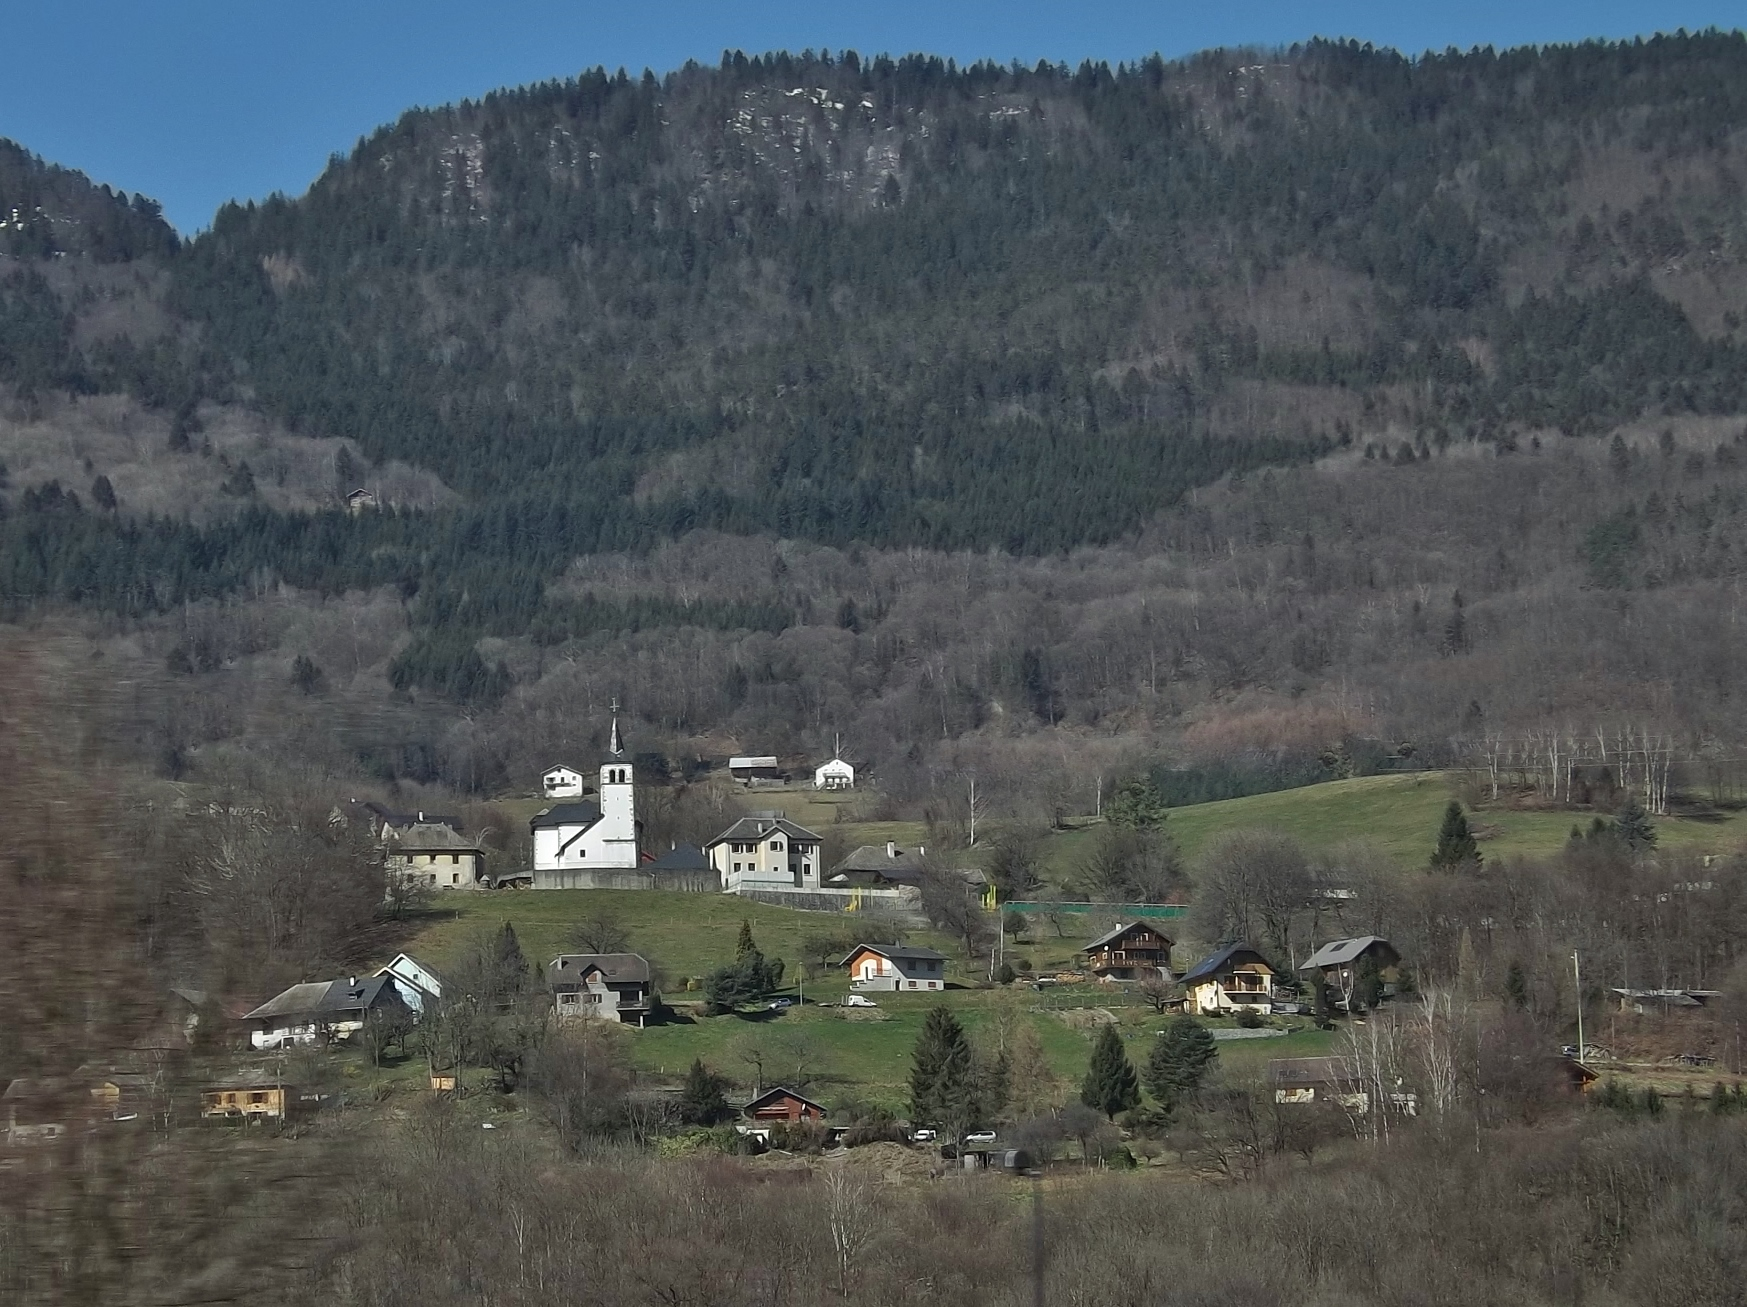 Saint-Alban-d'Hurtières